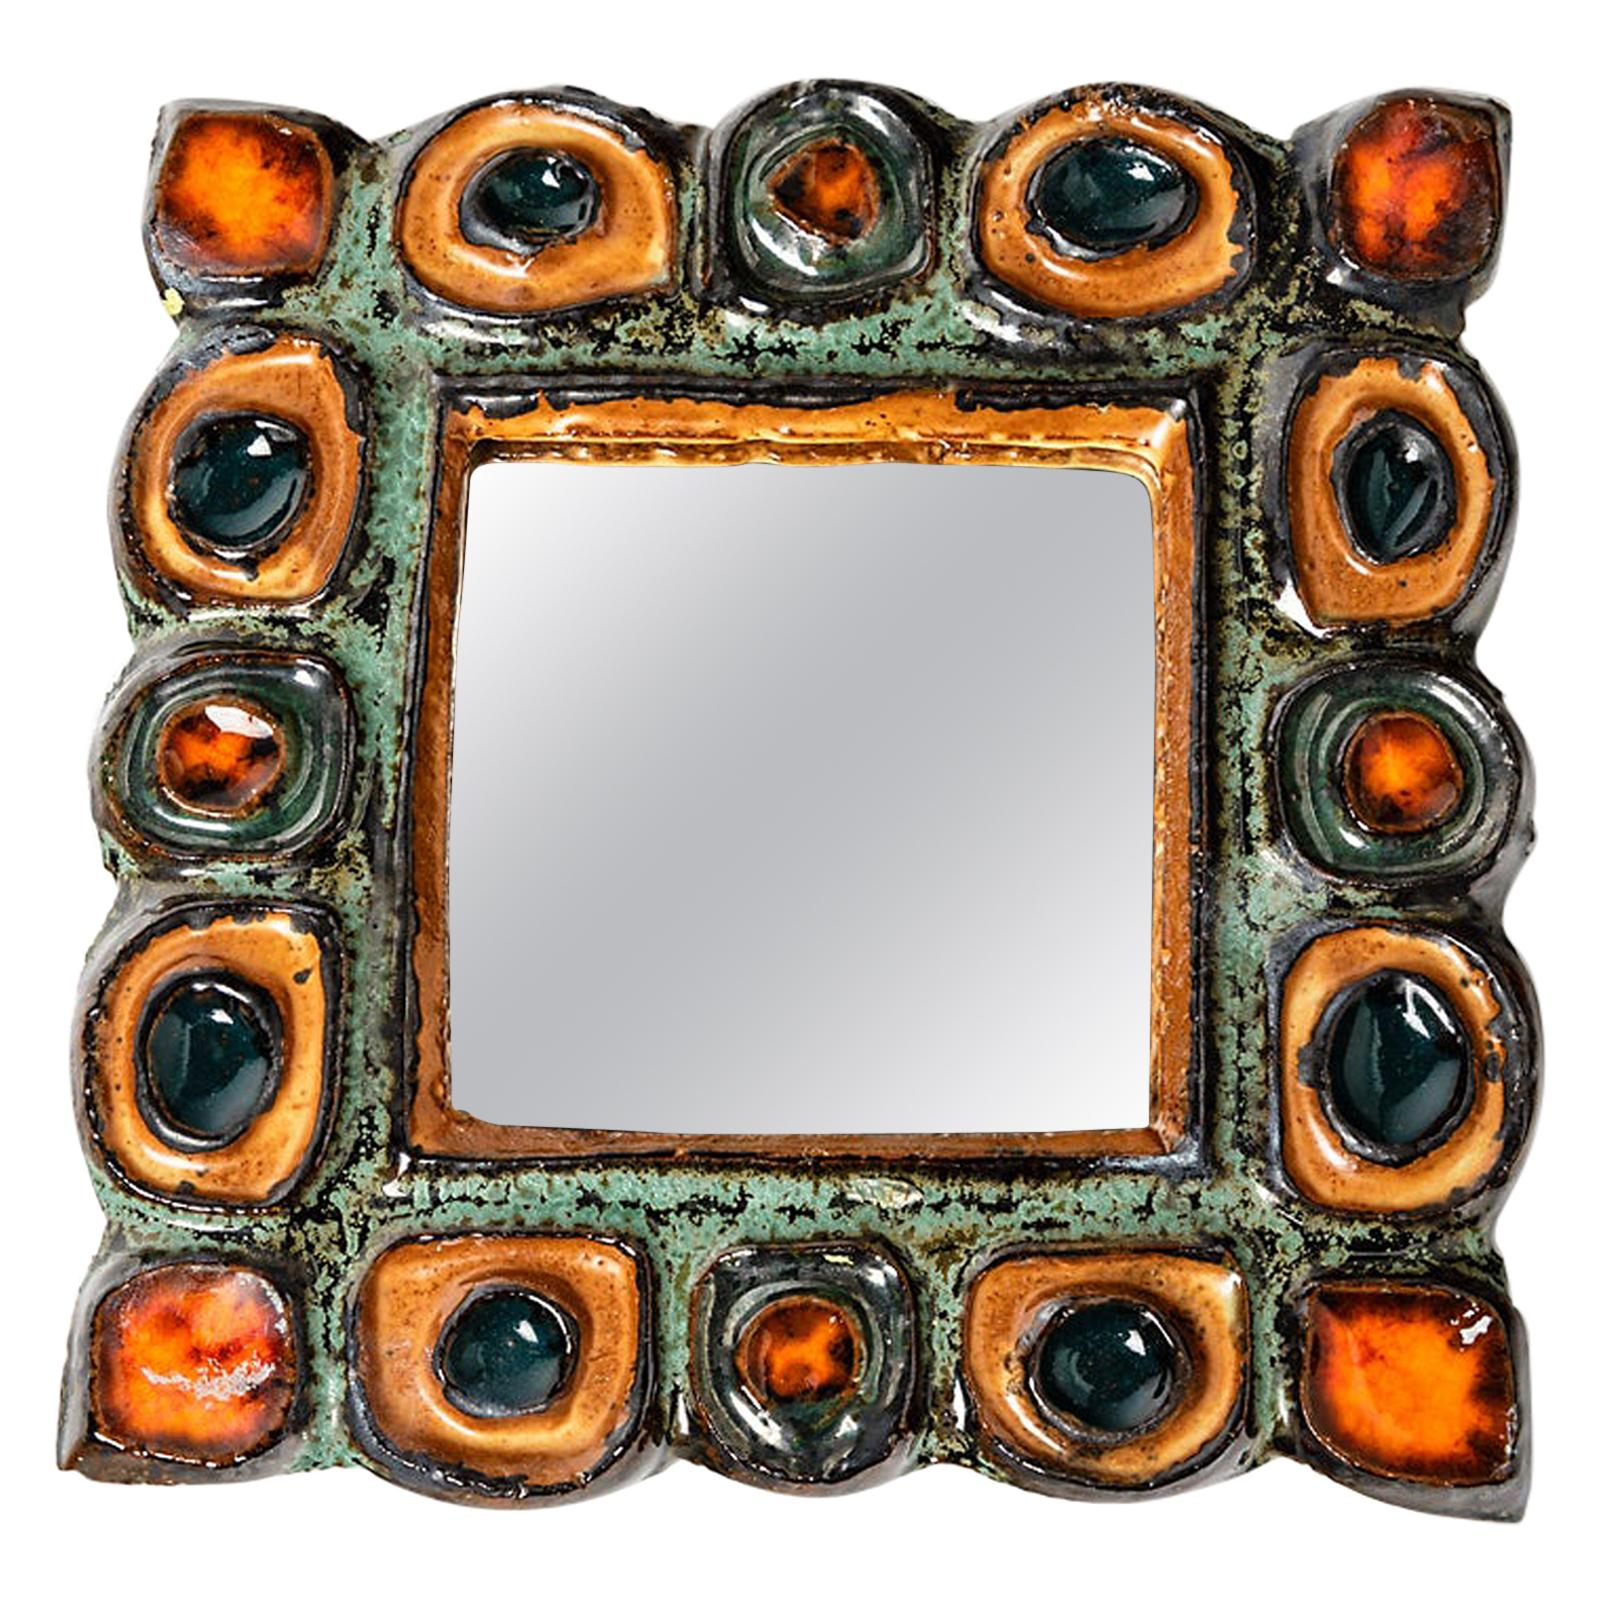 Decorative Wall Ceramic Mirror by Les Argonautes 1960 Orange and Green Colors